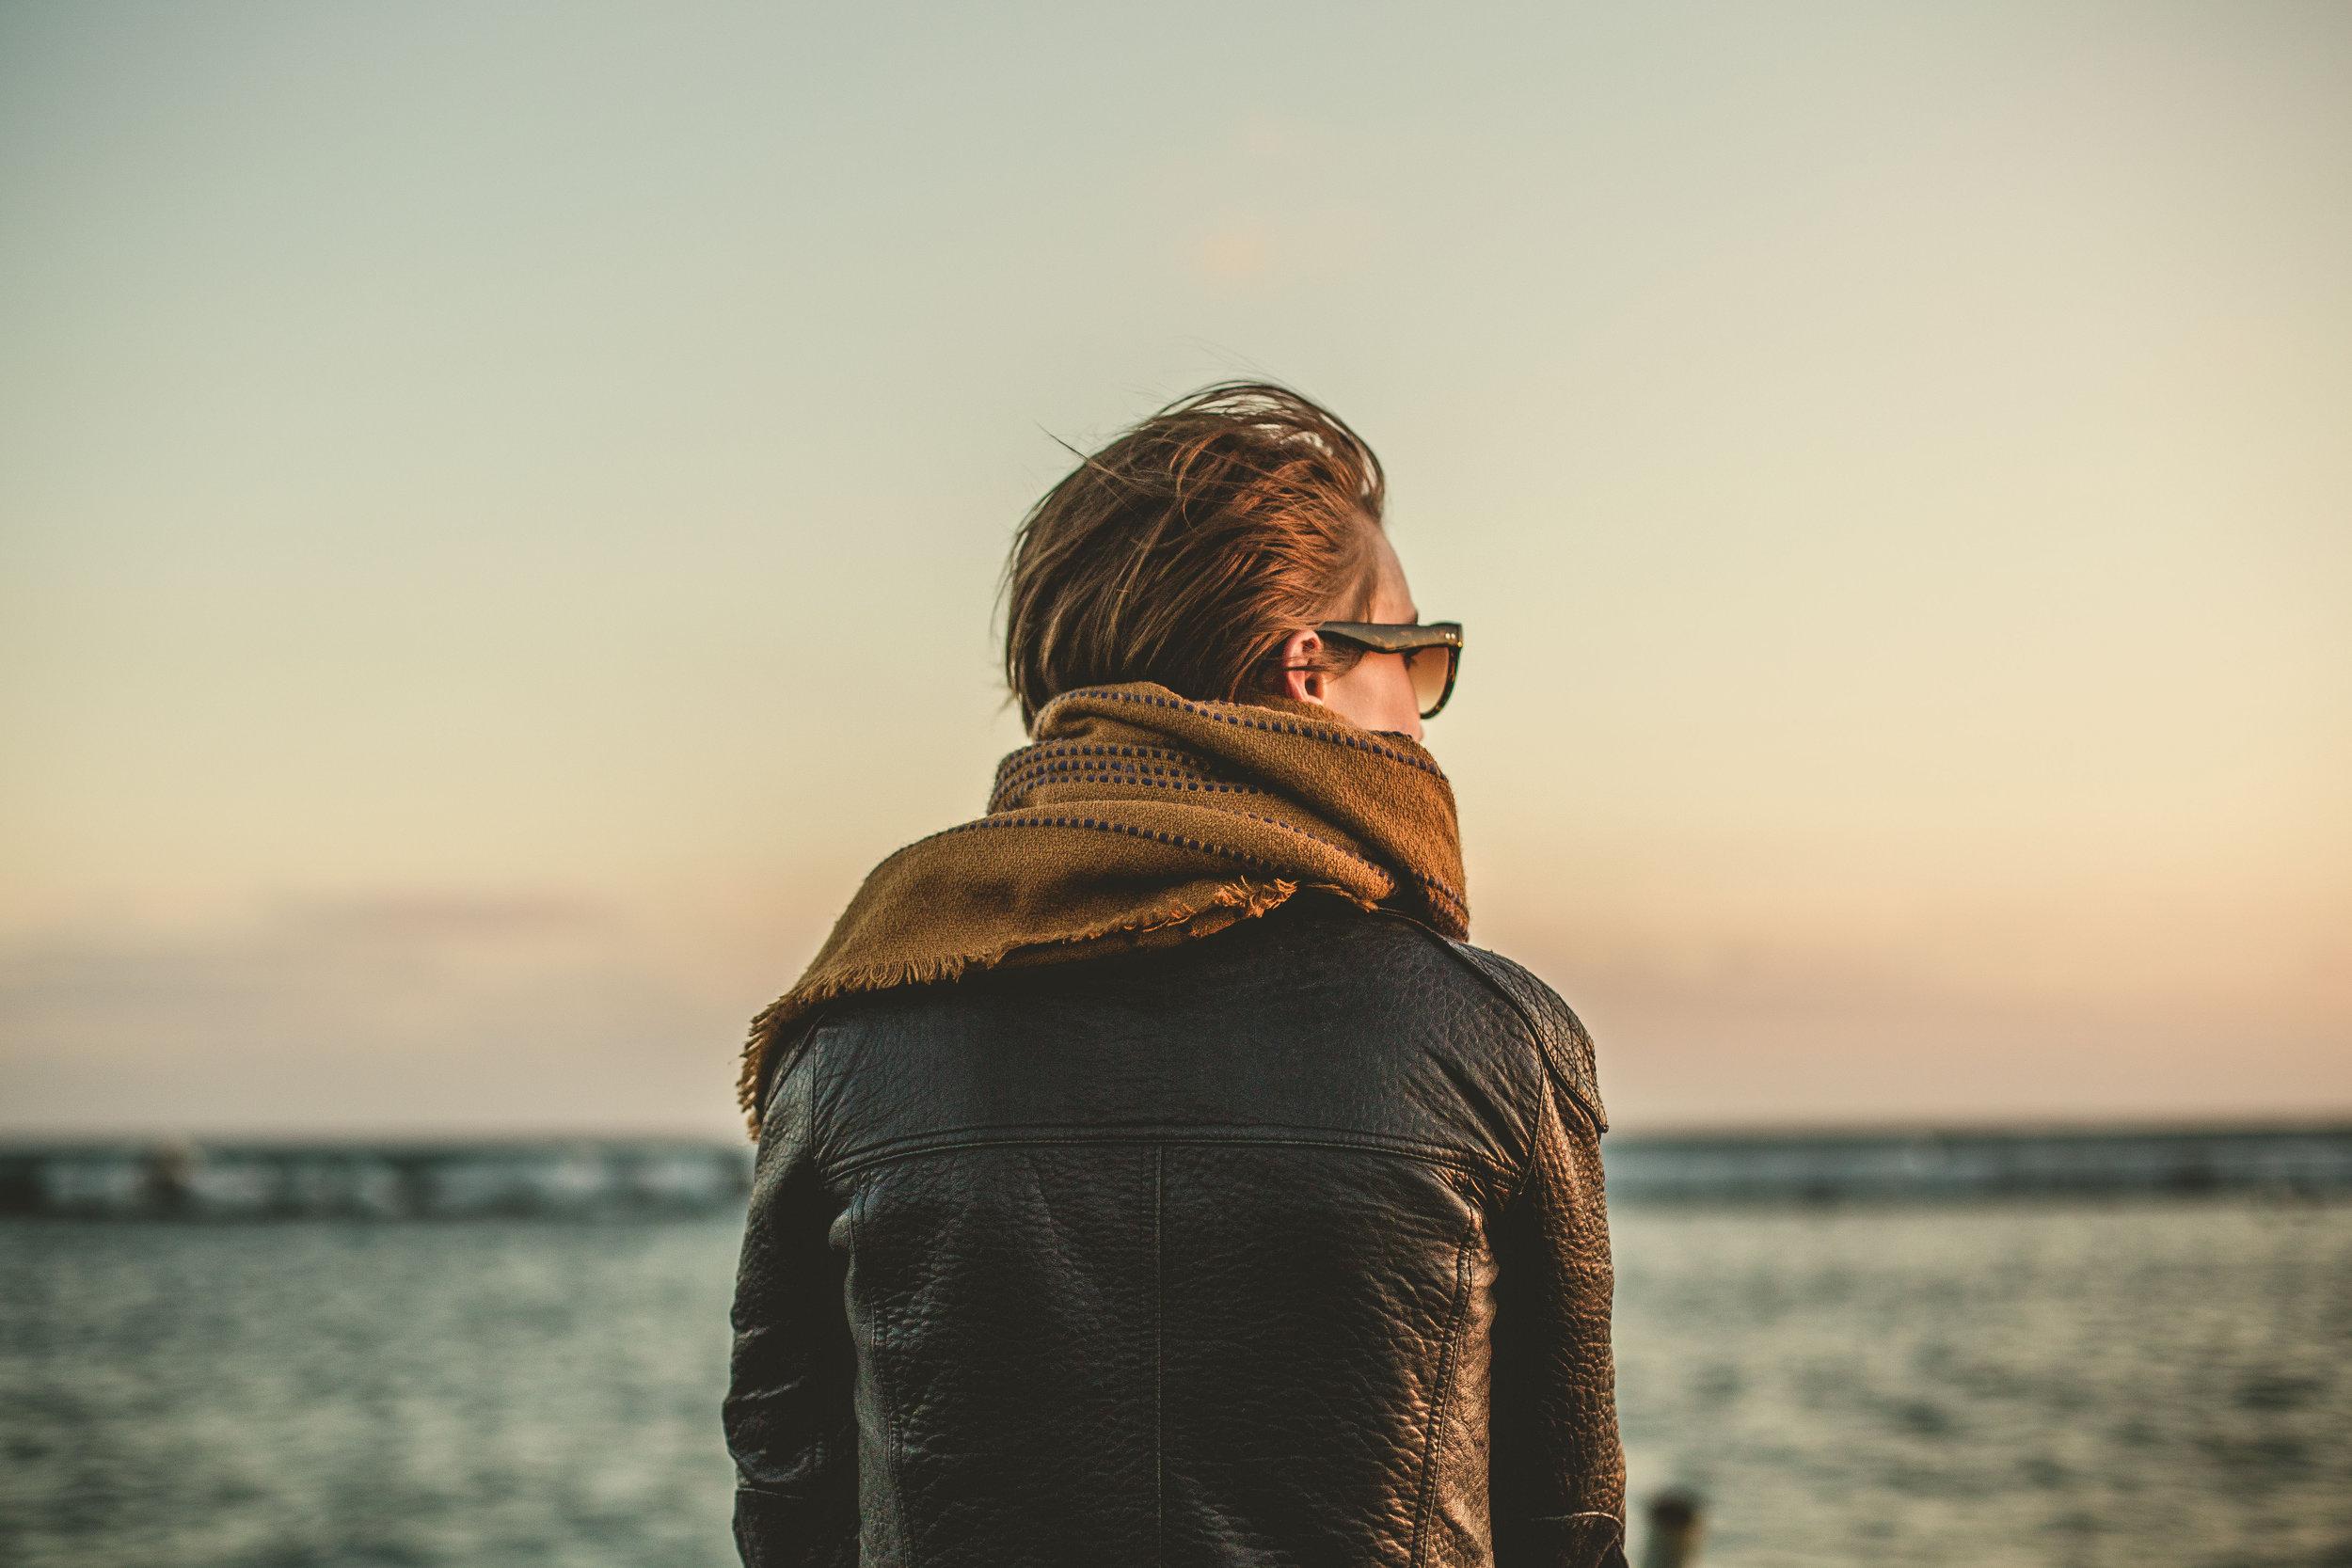 Lotus Therapies|Cumming, GA|Parenting|Divorce Recovery|Individual Counseling